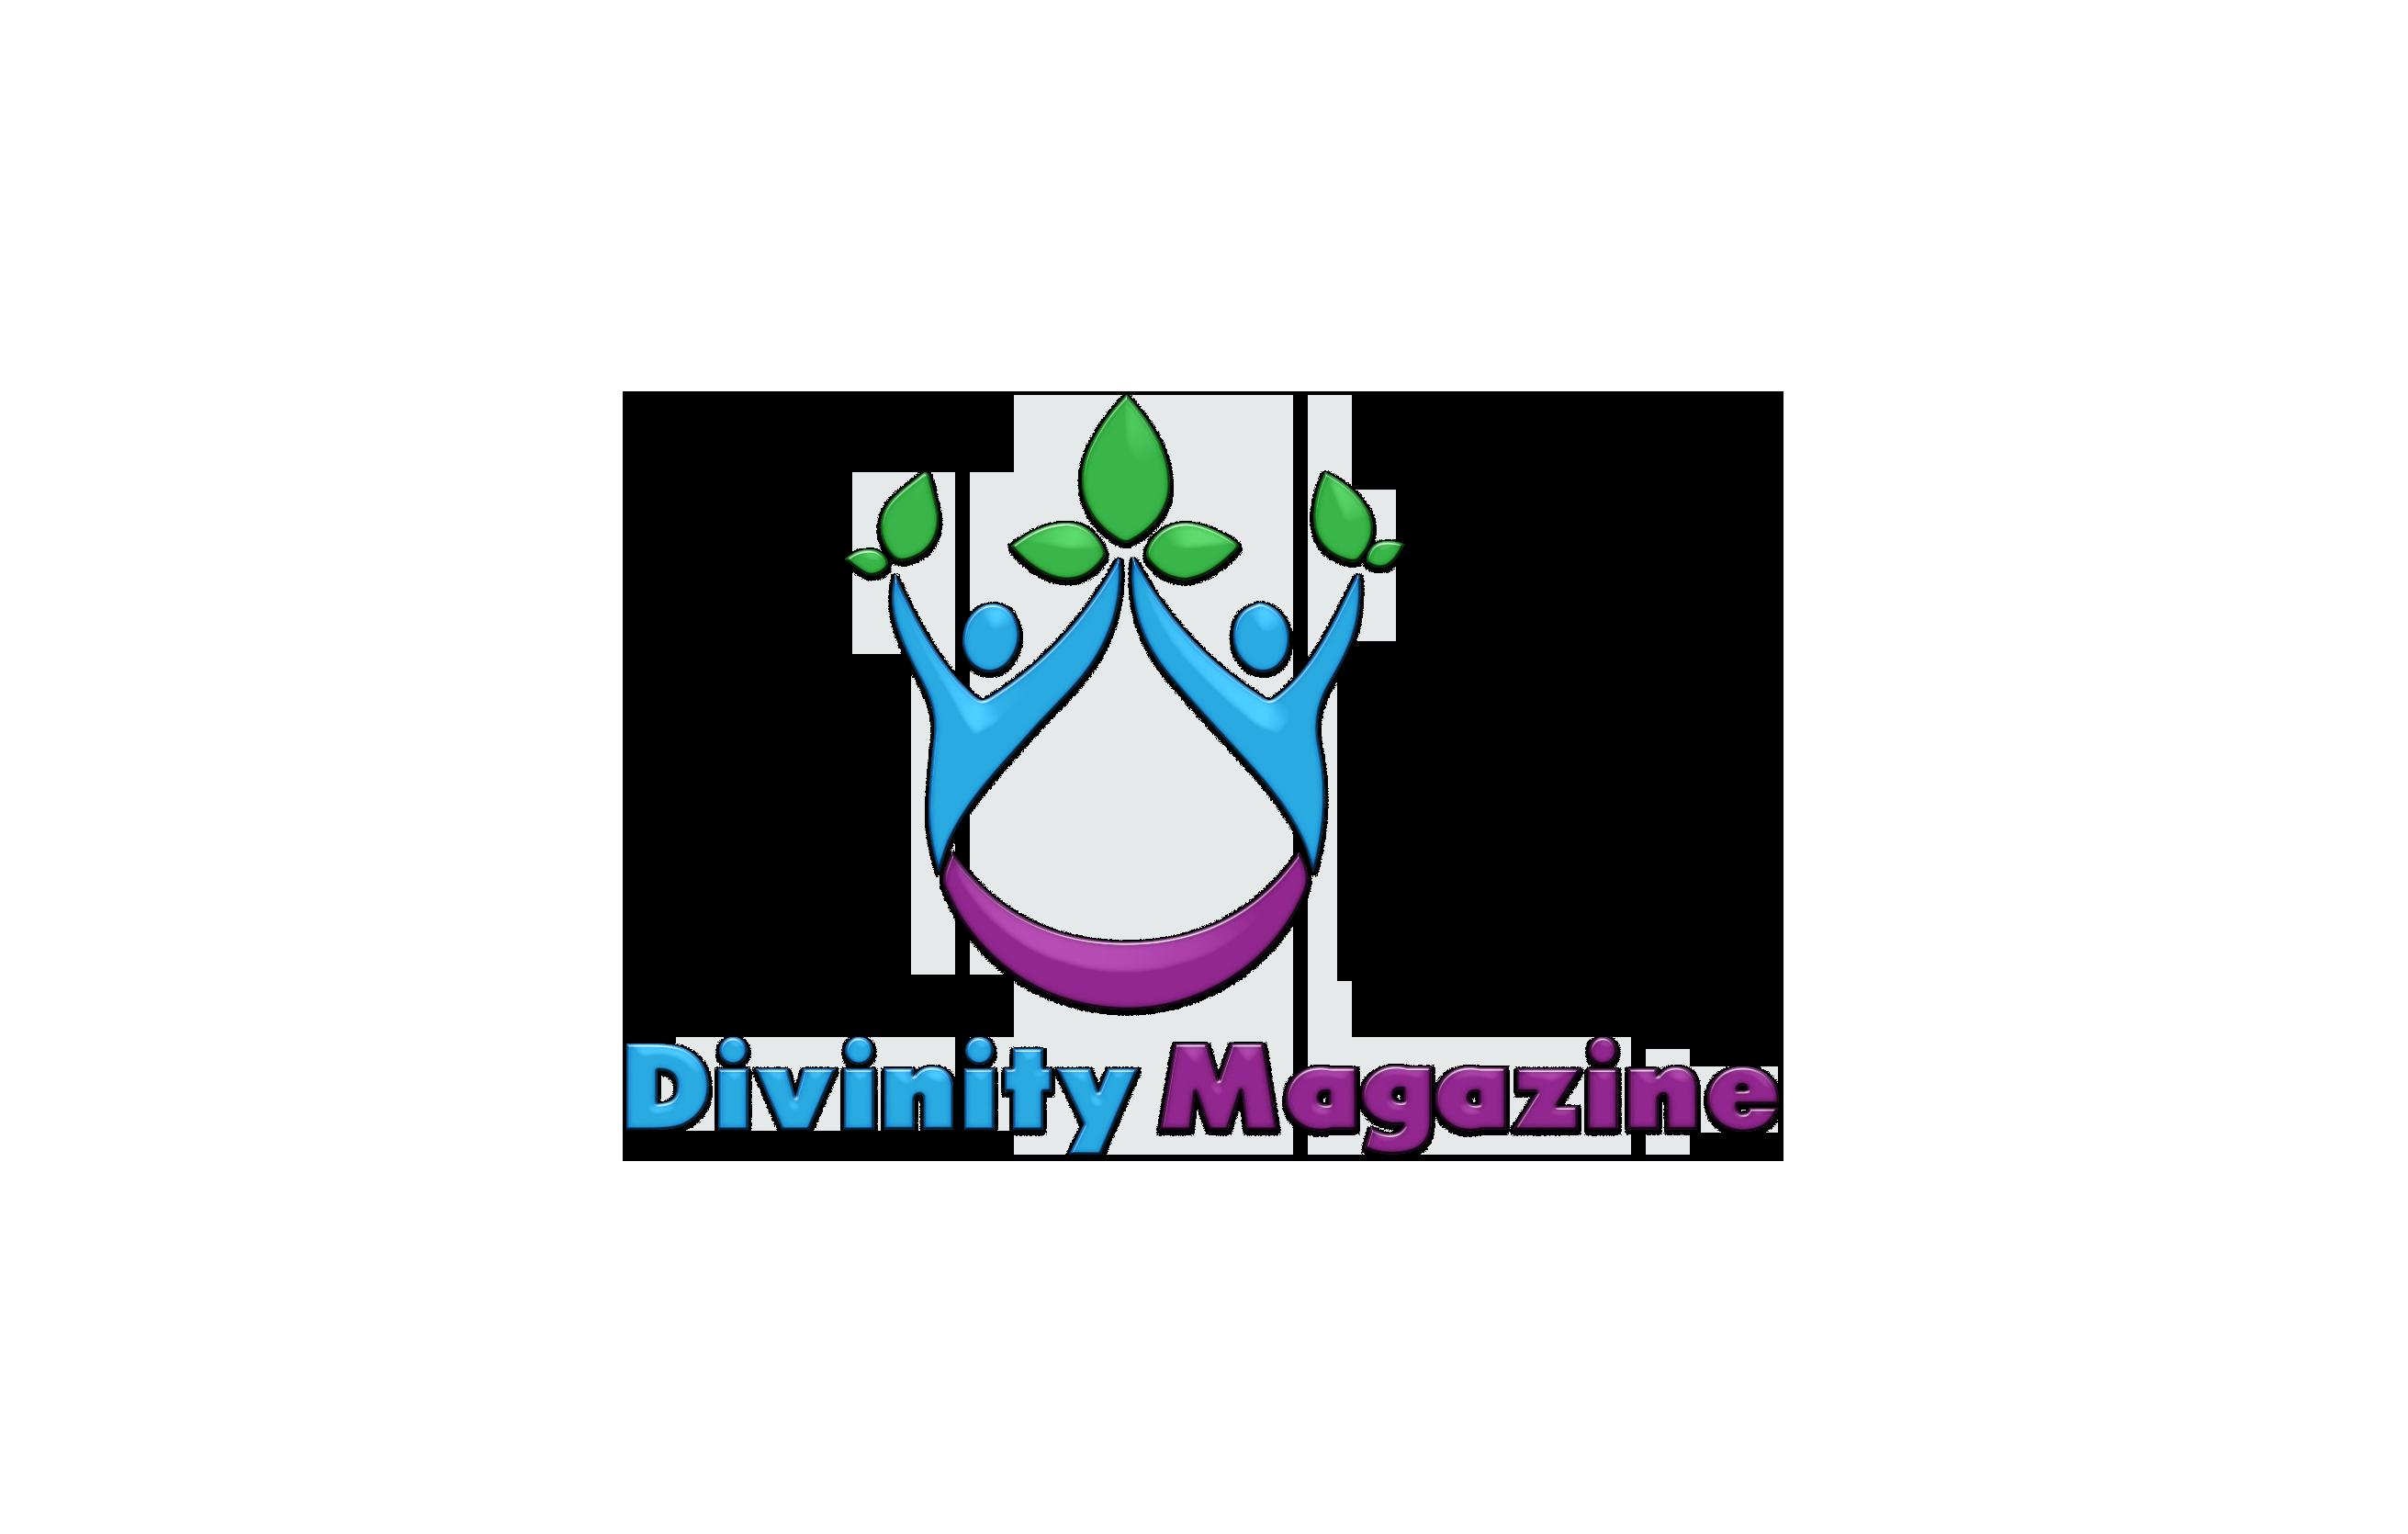 Divinity Magazine